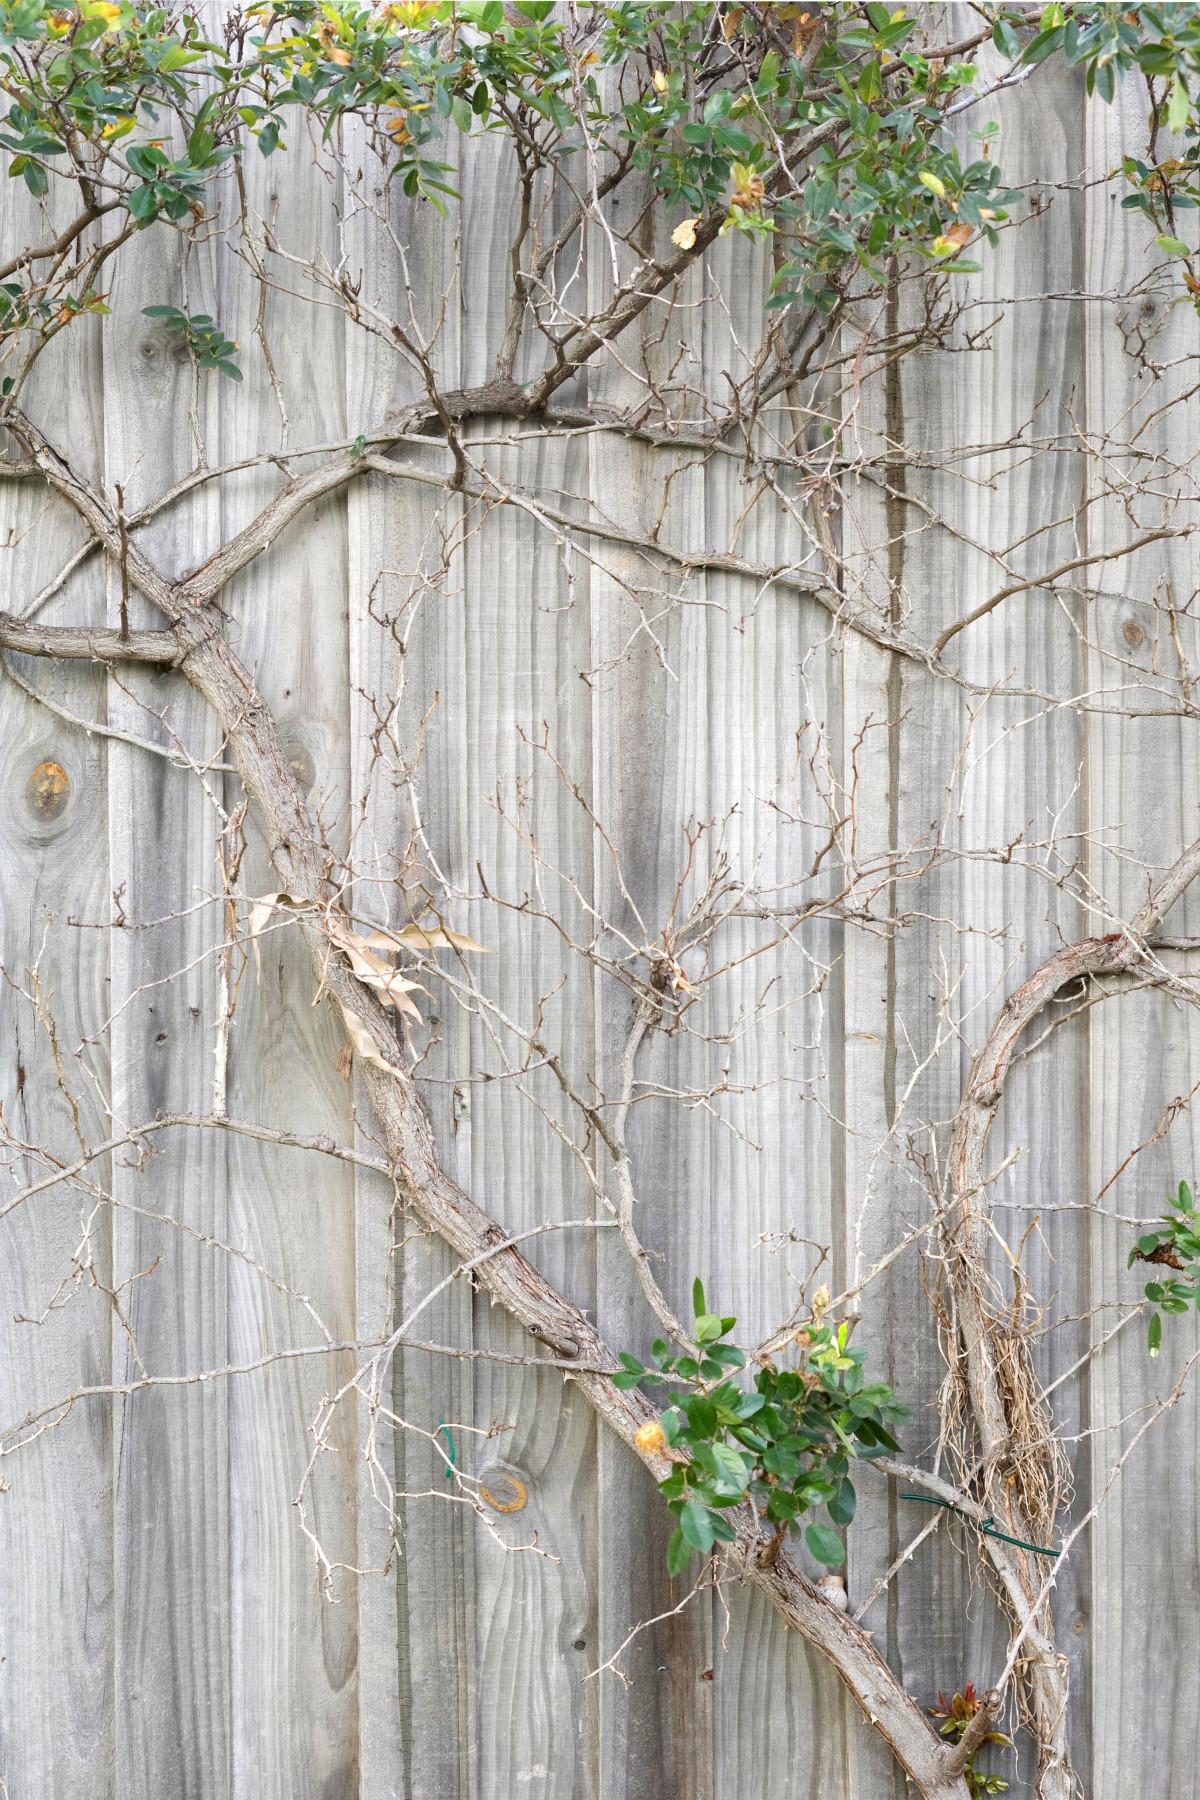 Free Images : tree, branch, fence, wood, leaf, flower, spring, birch ...